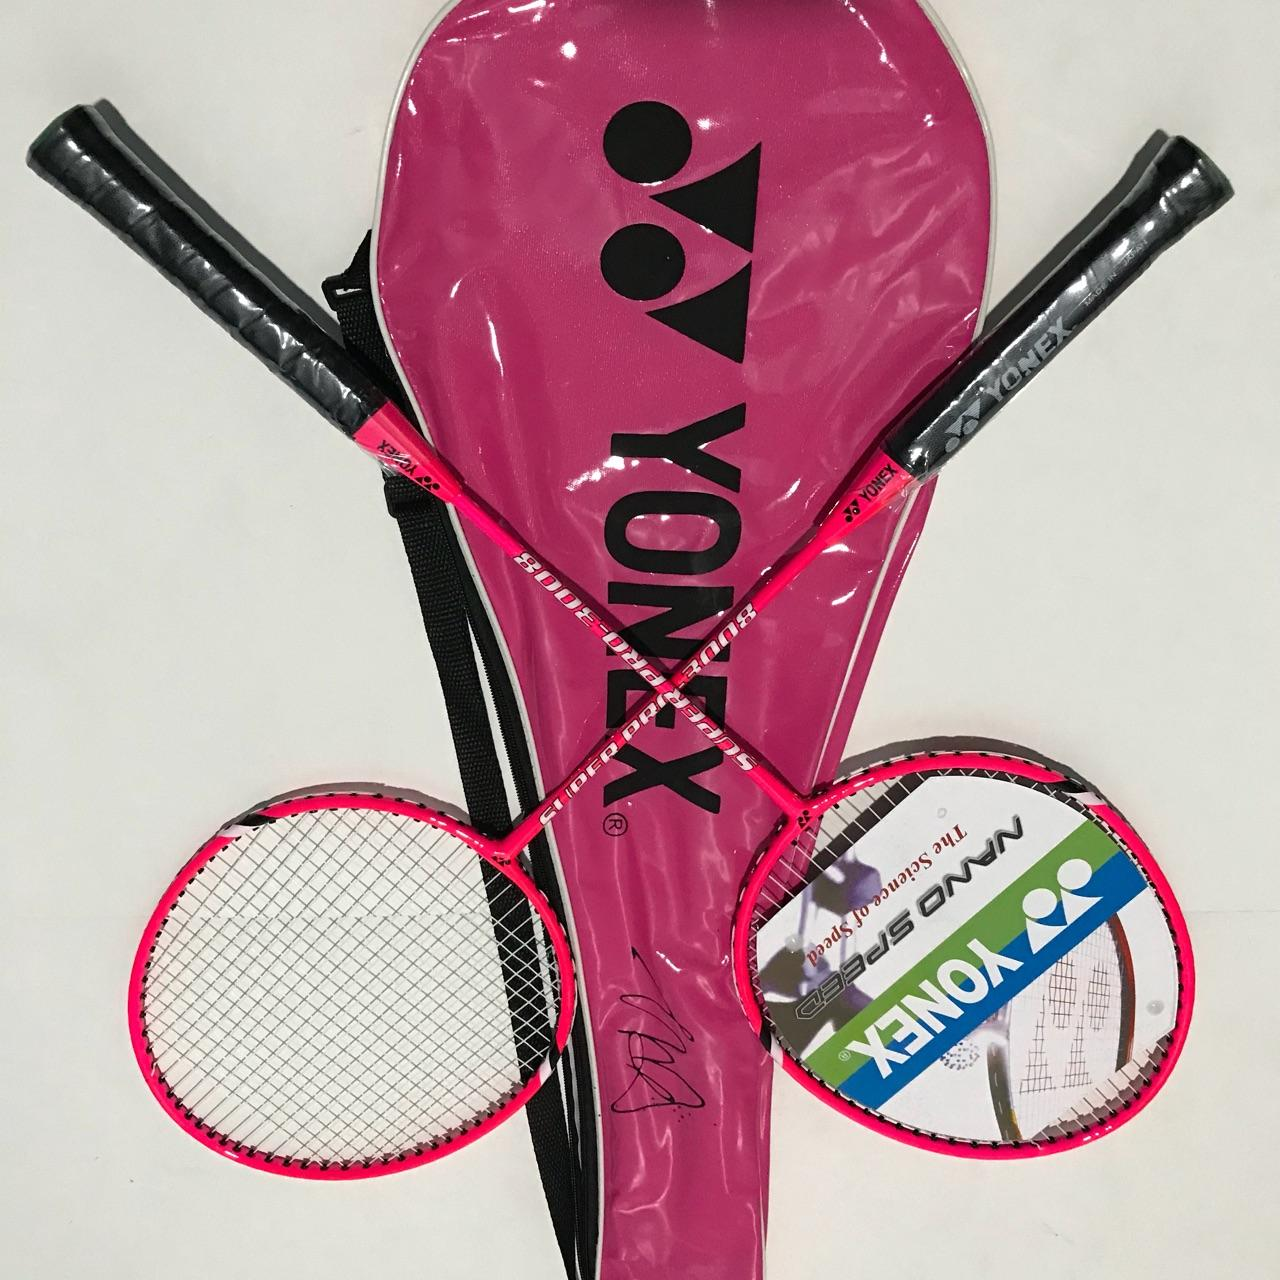 Badminton Racquets For Sale Online Brands Raket Morris Prices Reviews In Philippines